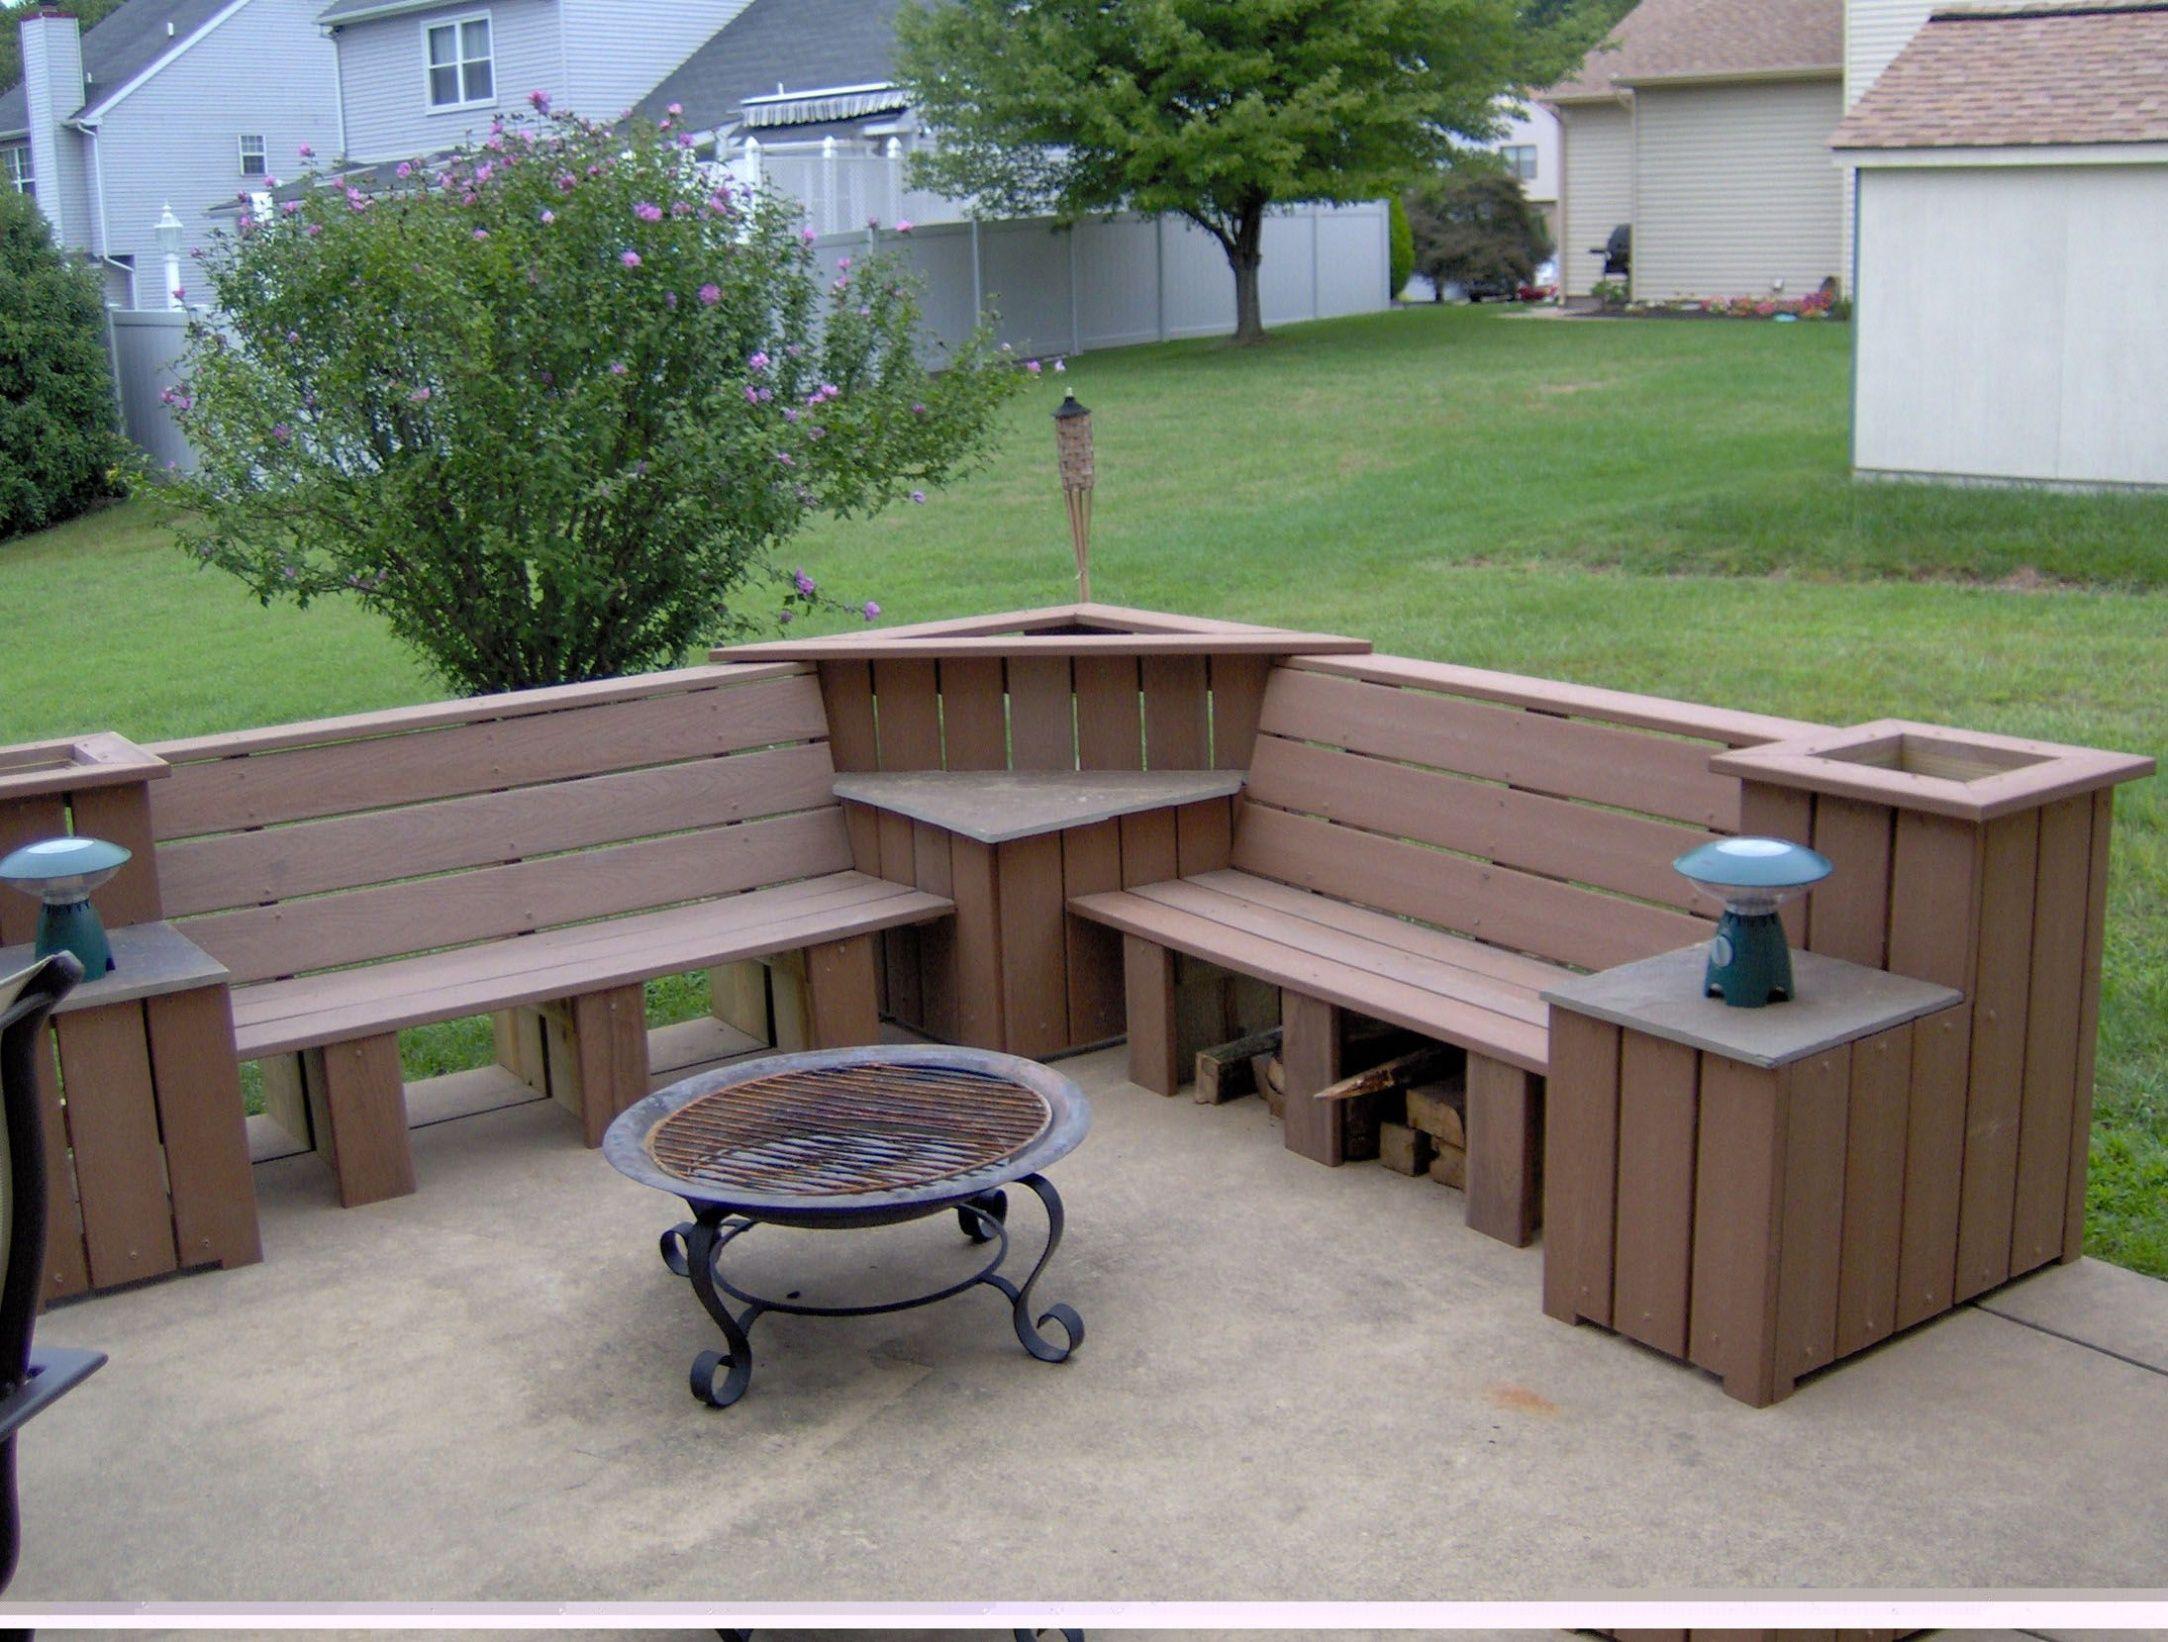 70 Awesome Diy Shipping Pallet Sofa Ideas Diy Garden Furniture Outdoor Corner Bench Outdoor Wood Decking